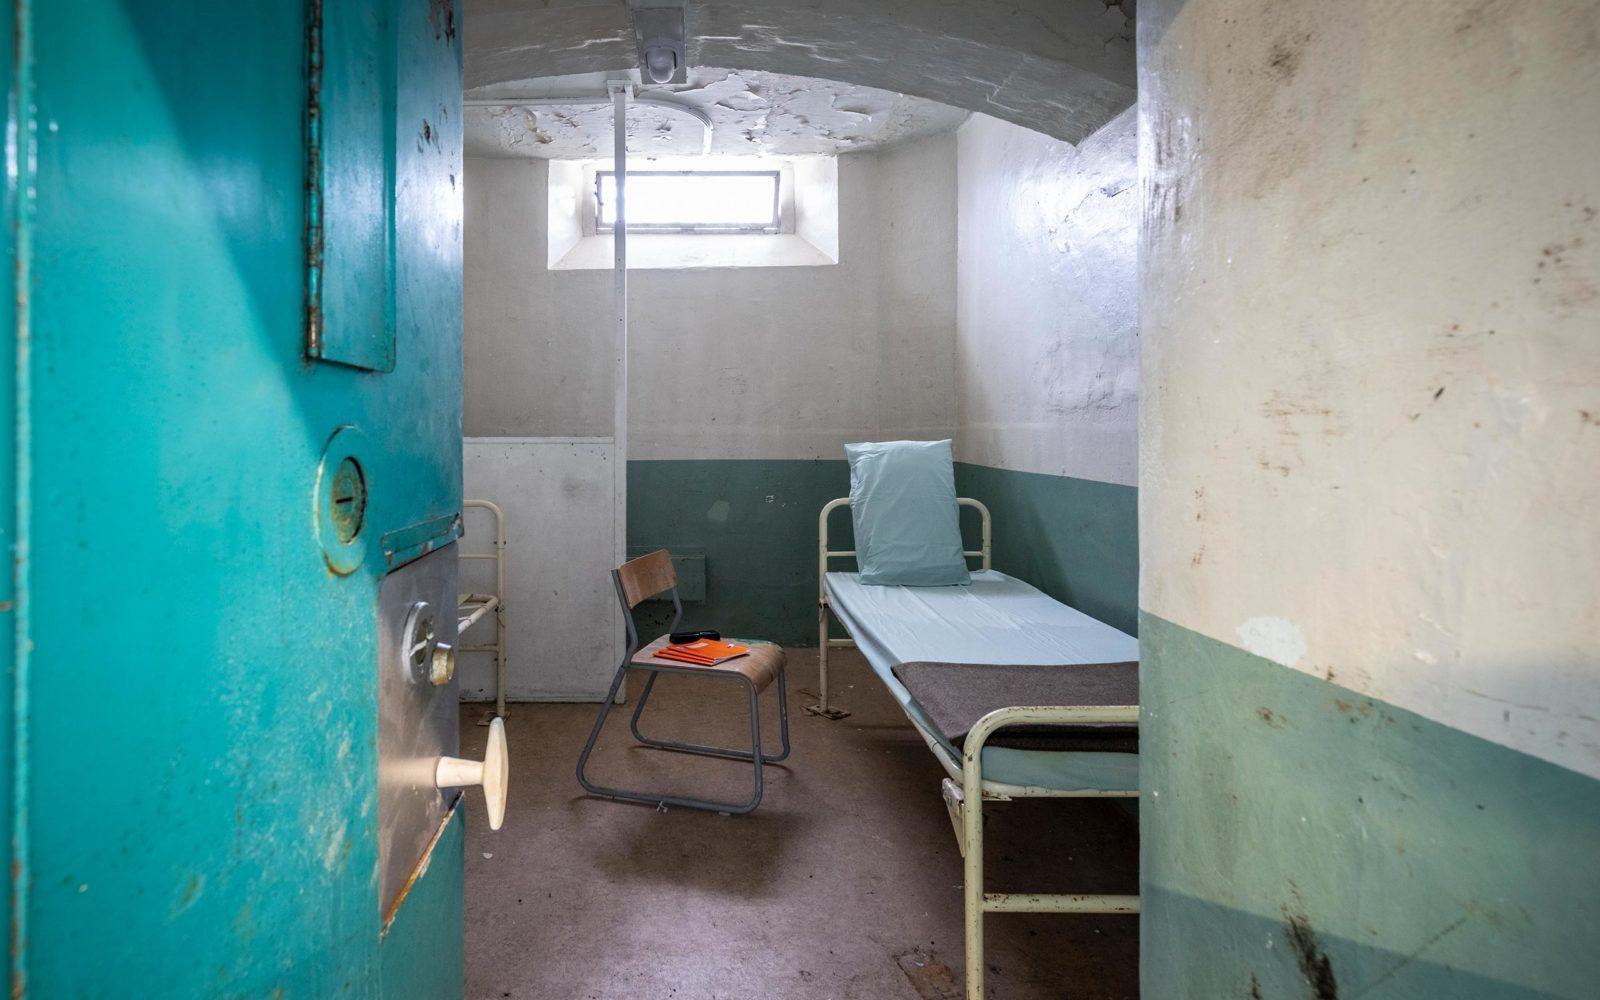 Shepton Mallet Prison Film Production